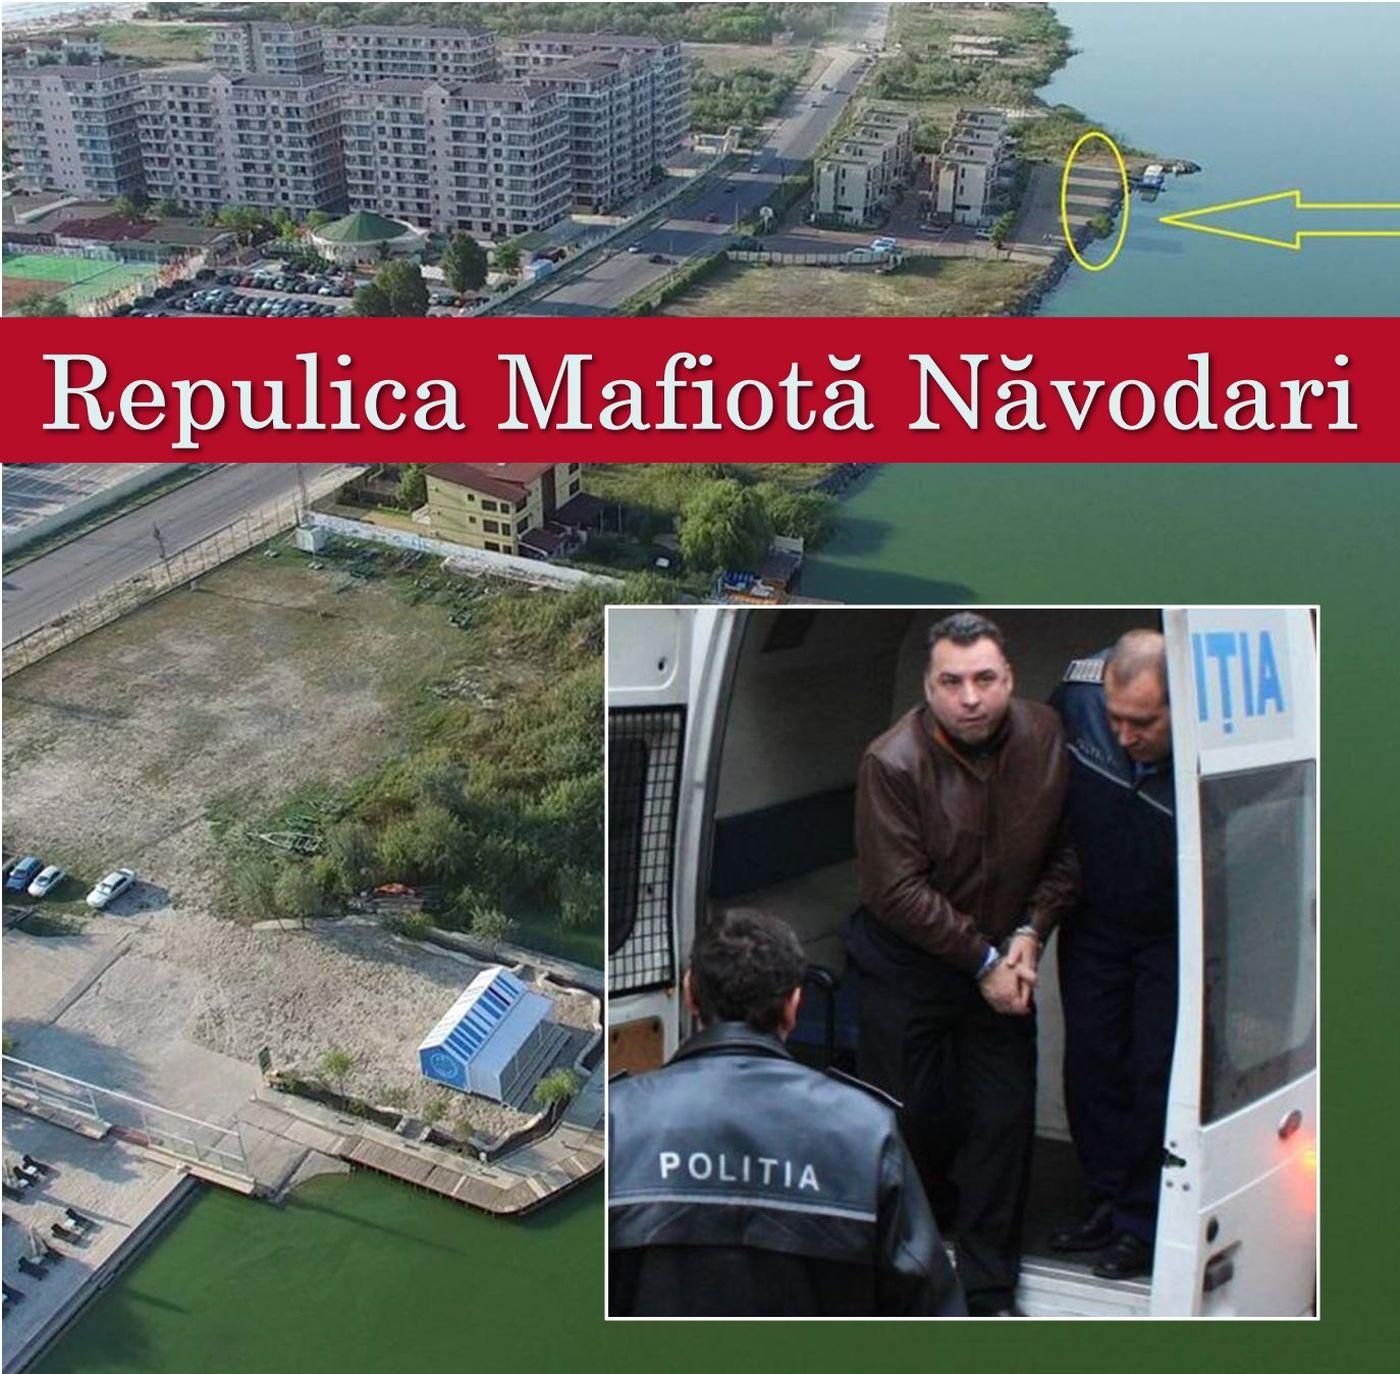 republica mafiota navodari_crop_crop